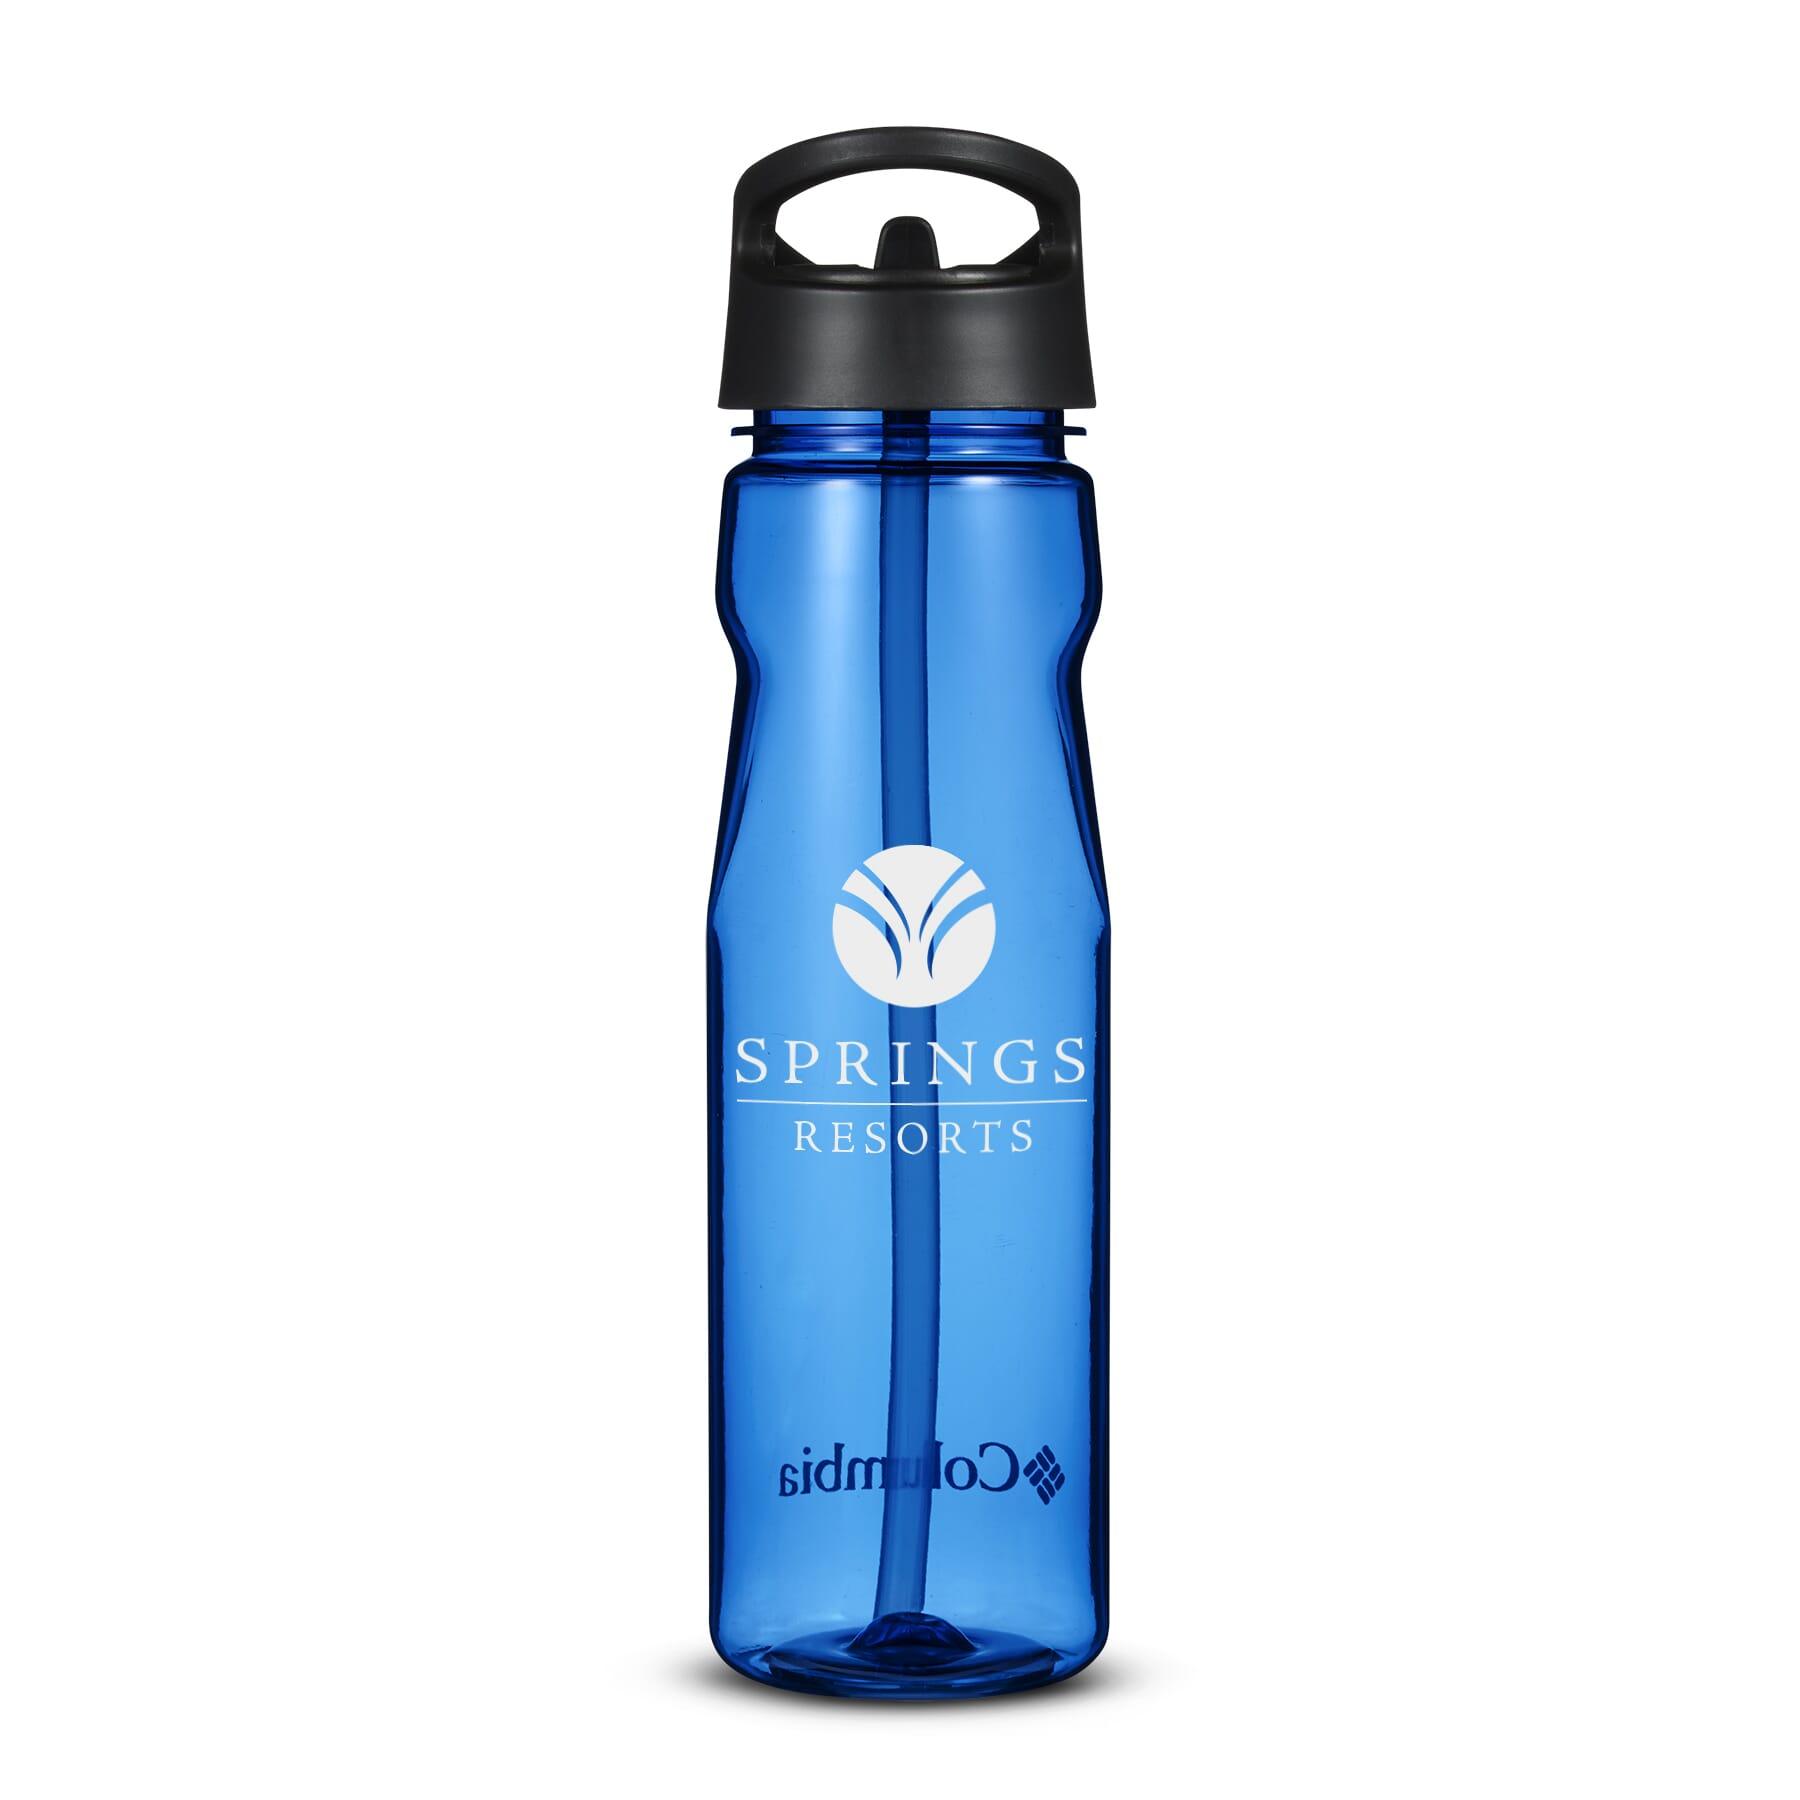 Customized royal blue water bottle